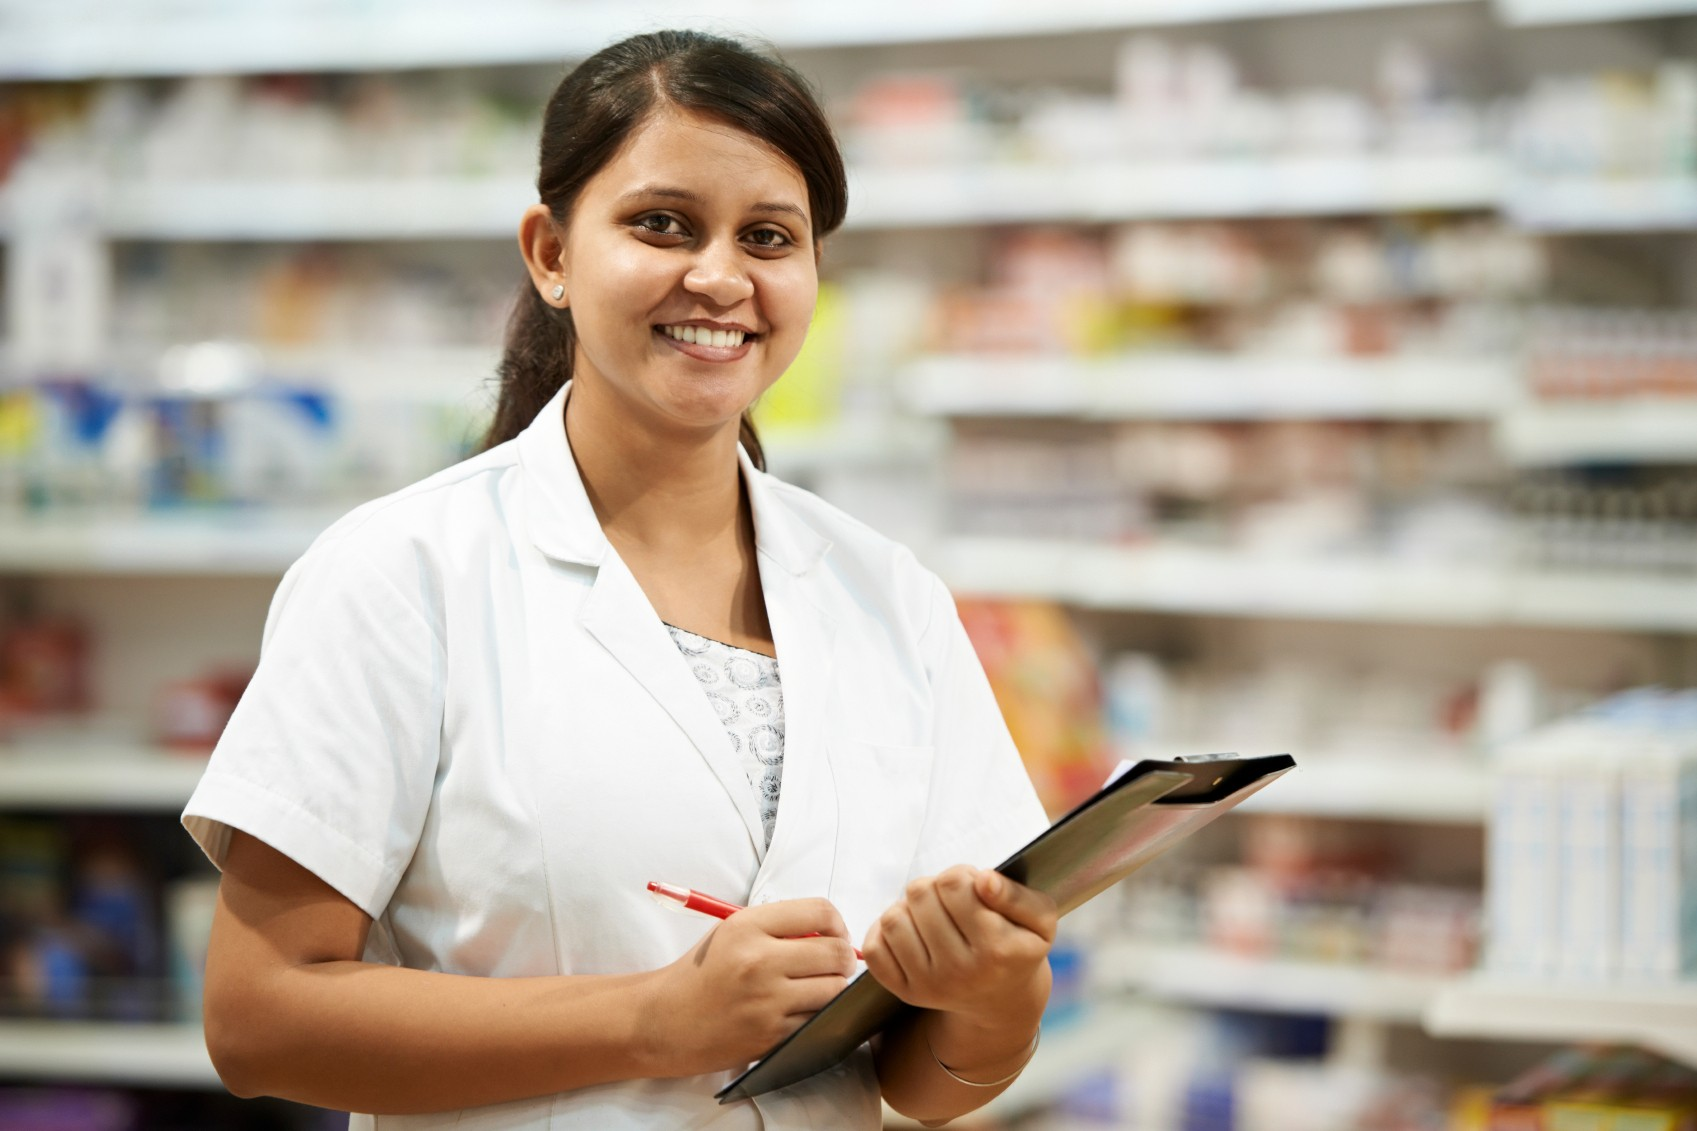 pharmacist magazine